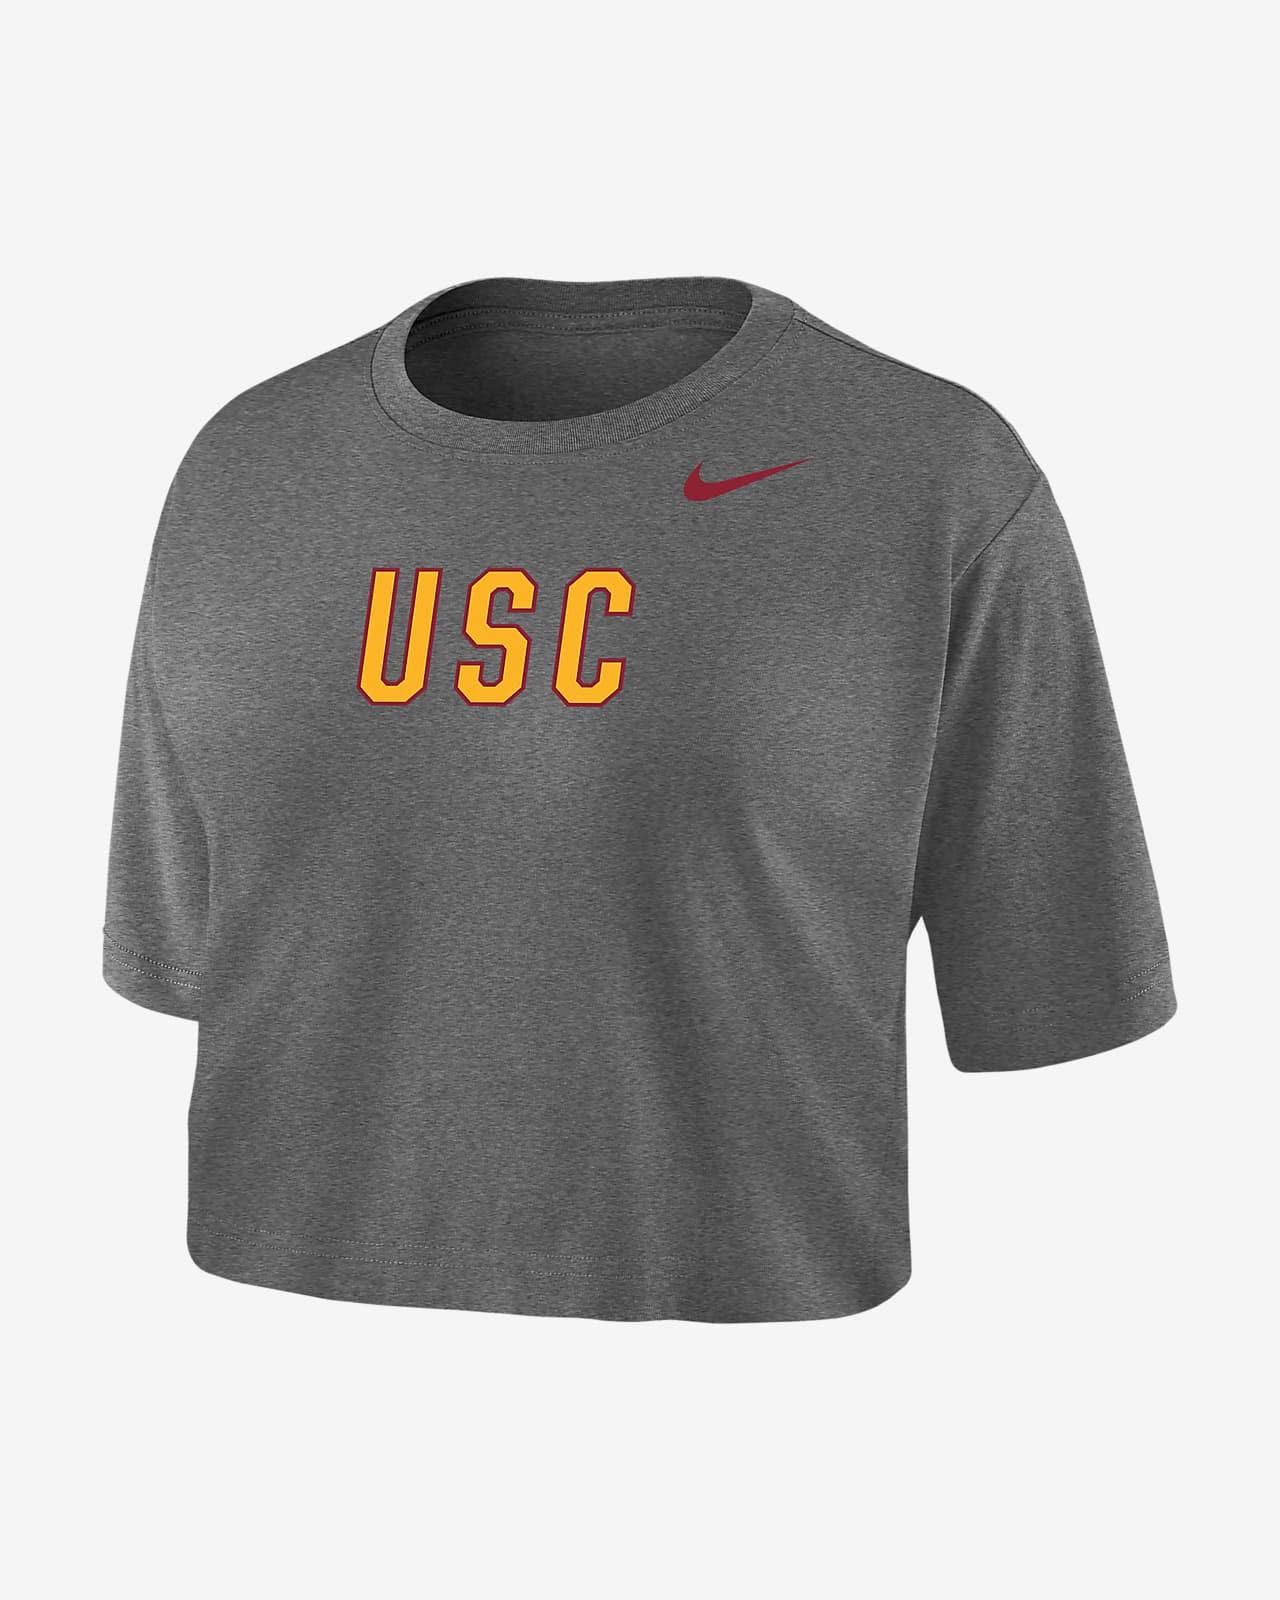 Nike College Dri-FIT (USC) Women's Crop T-Shirt